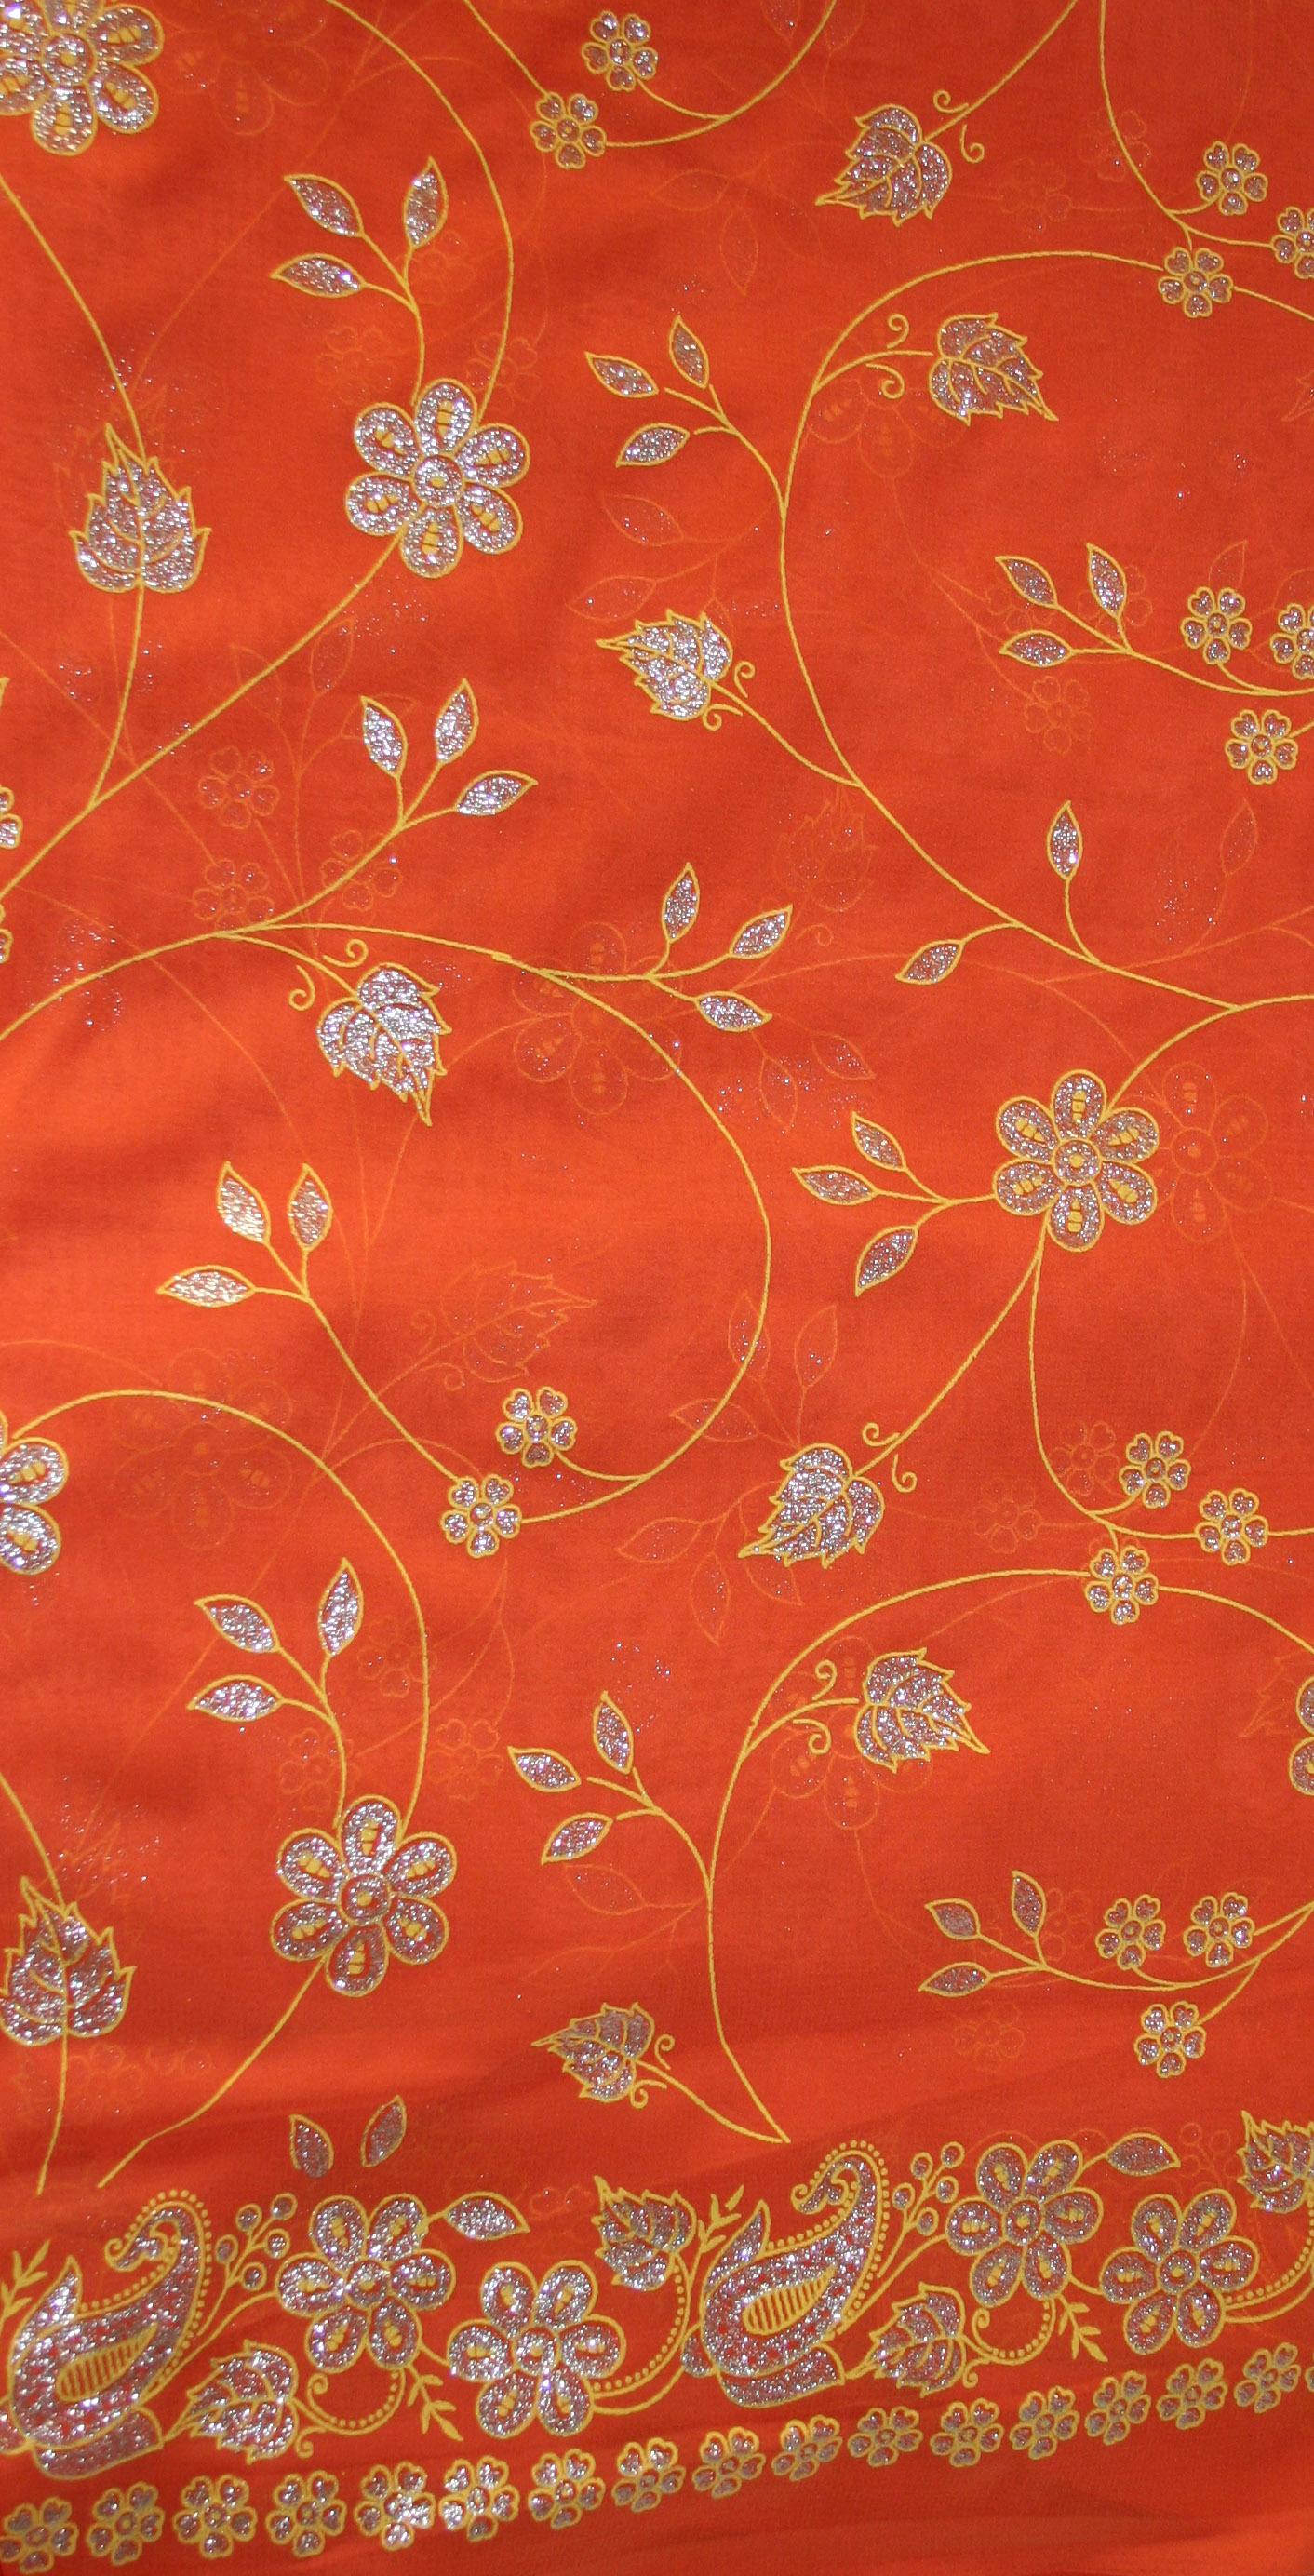 Sari Fabric 7 by Falln-Stock